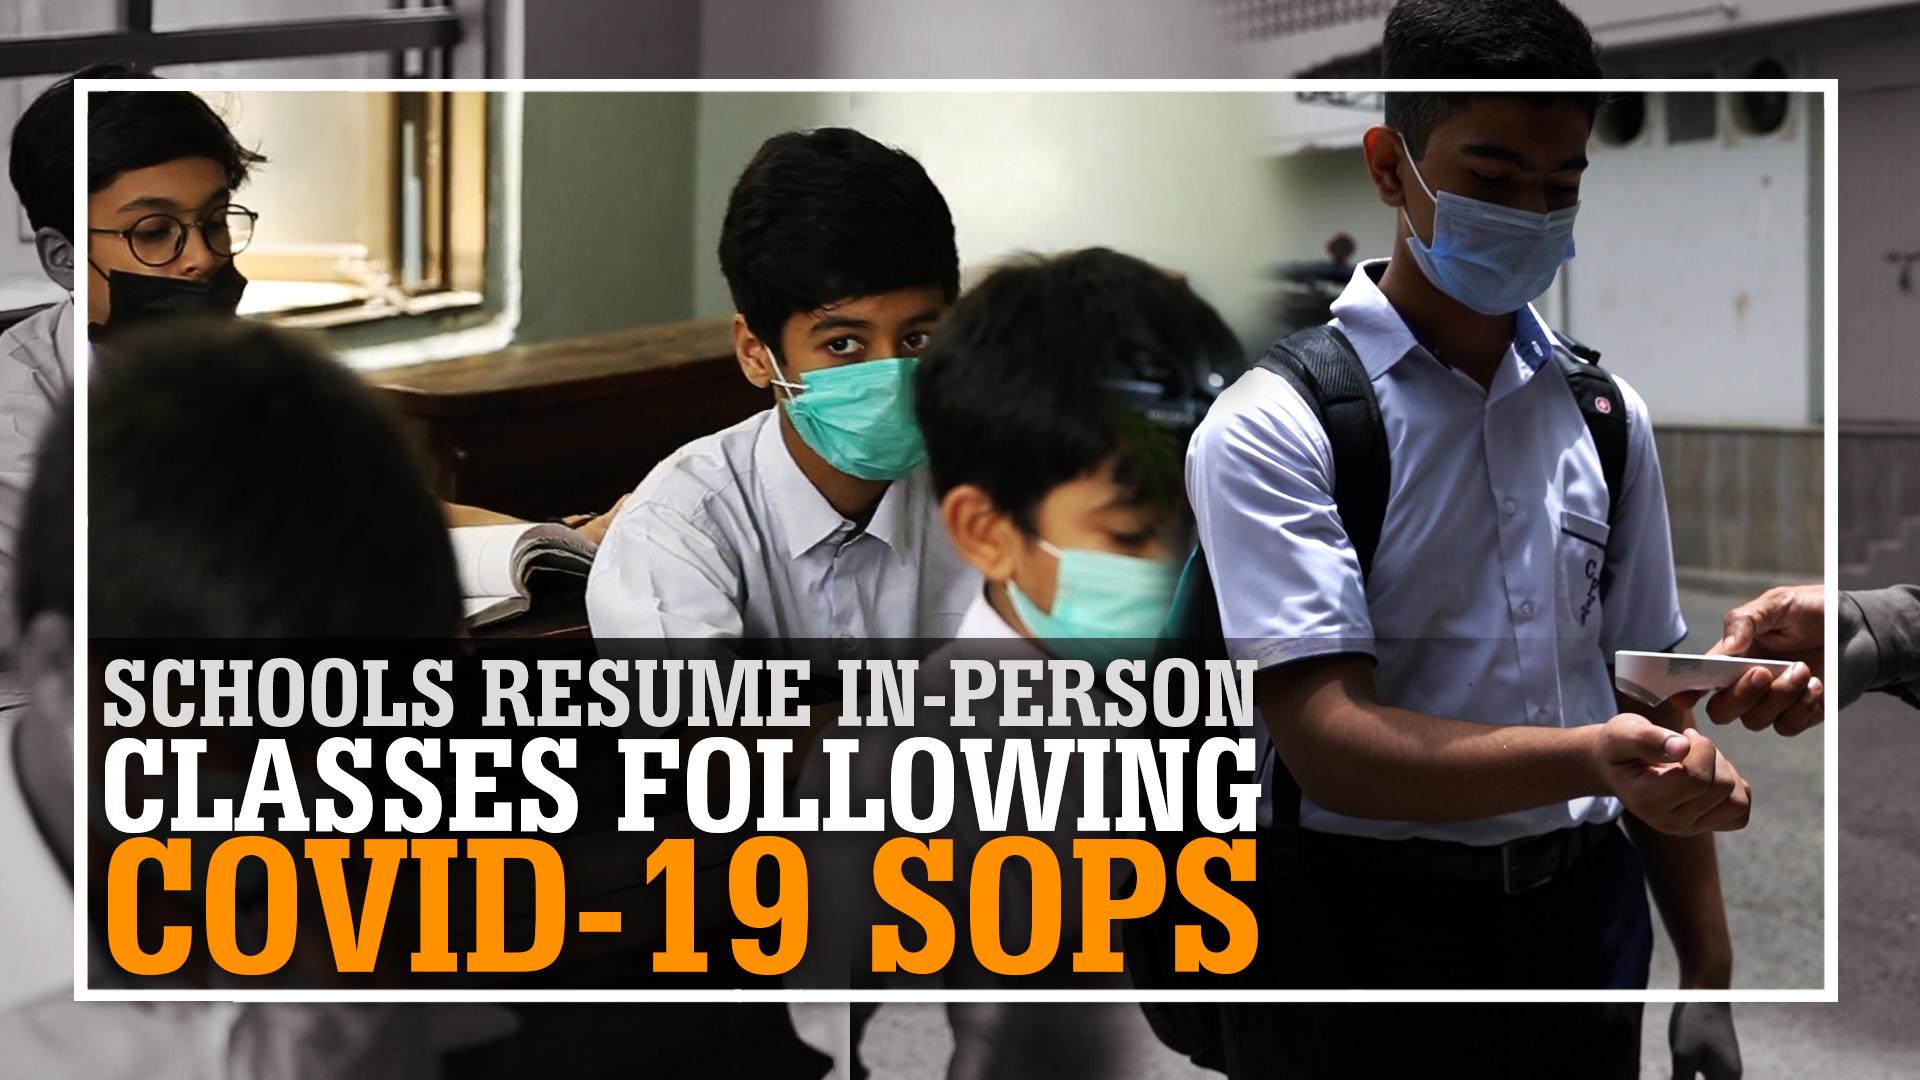 schools-resume-in-person-classes-following-covid-19-sops